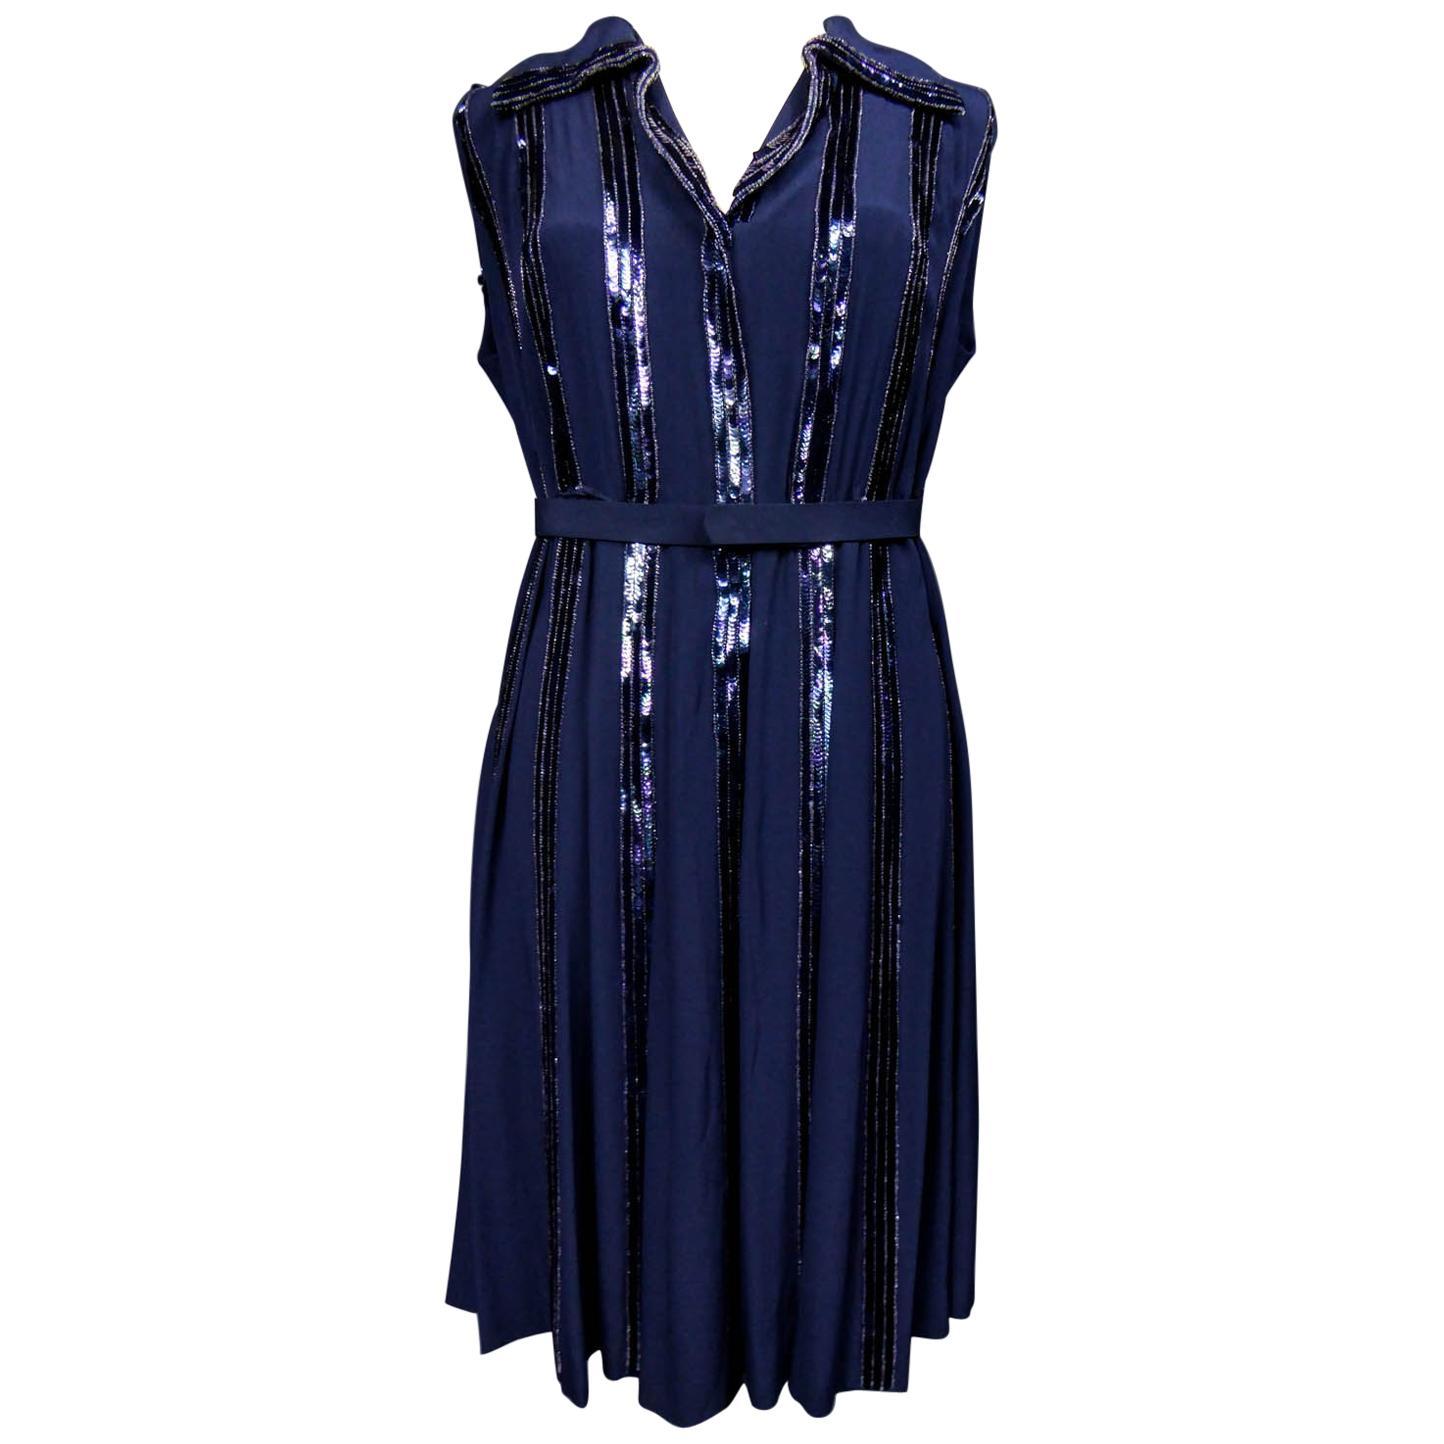 Worth Couture Dress, Circa 1960